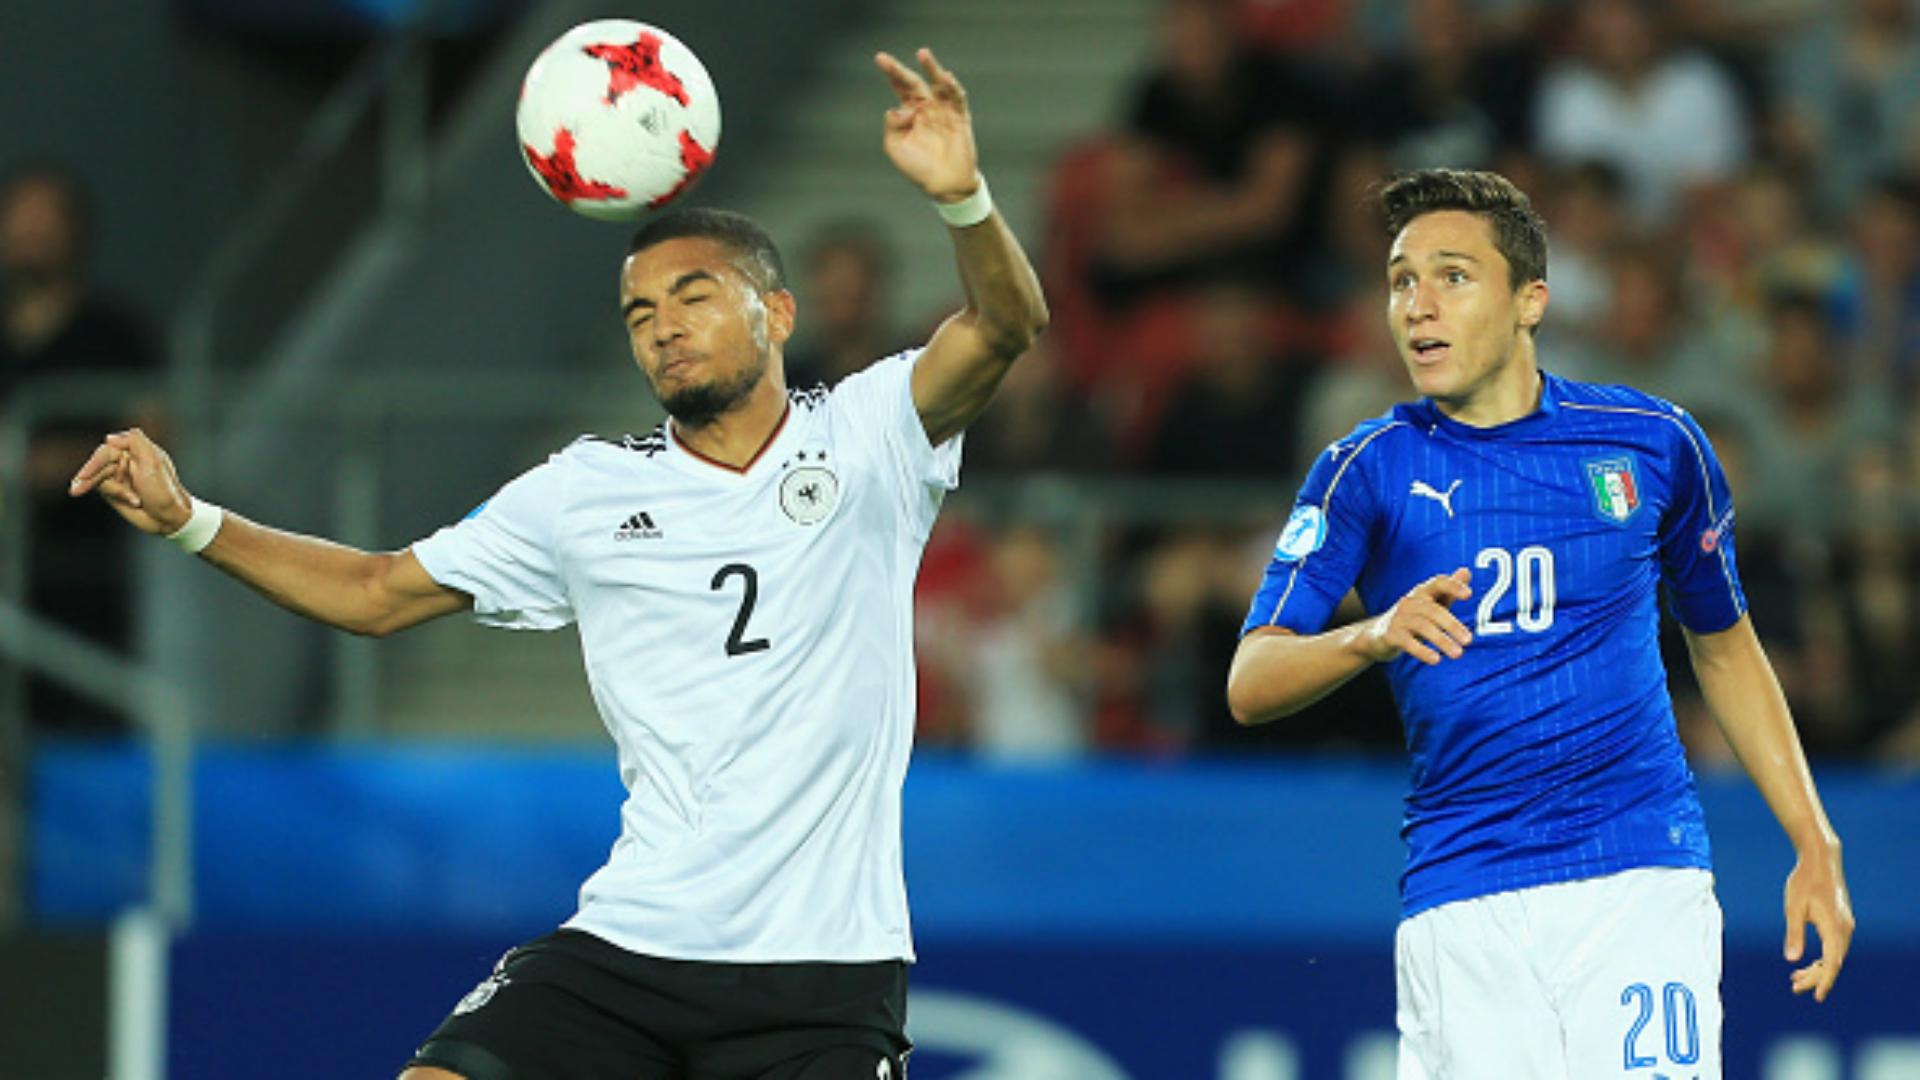 Jeremy Toljan Federico Chiesa Italy Germany U21 European